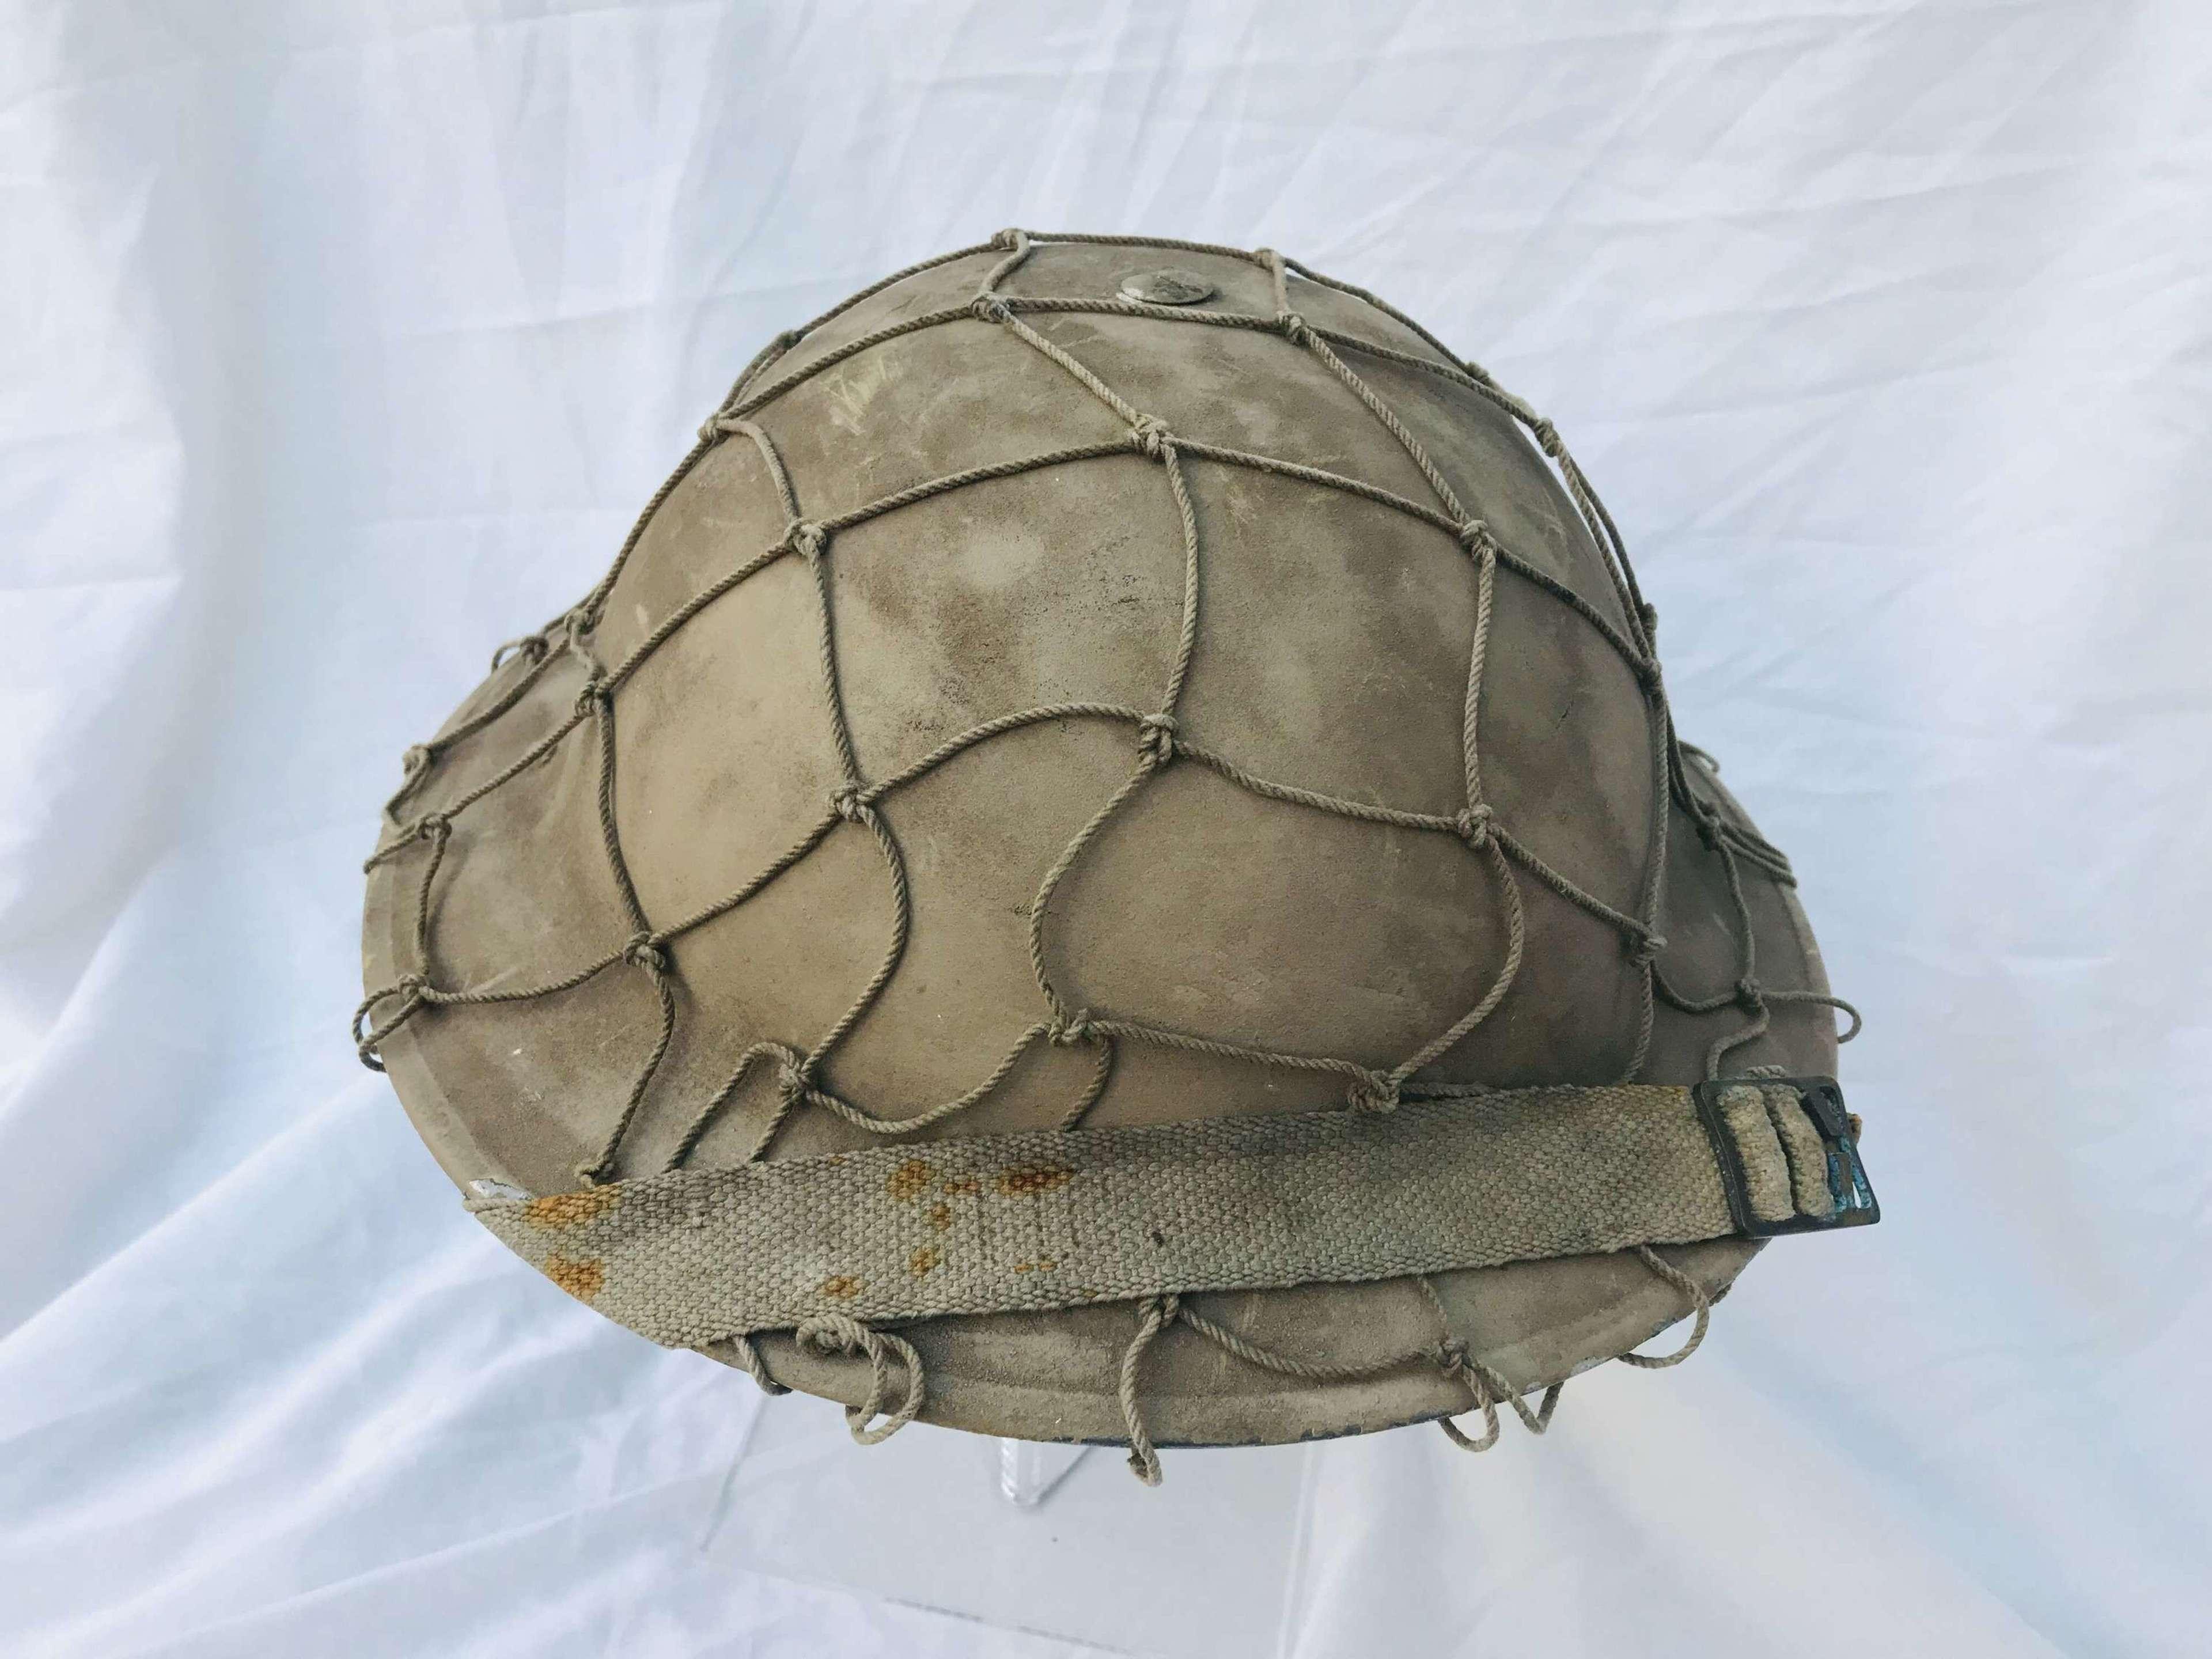 1939 Dated British helmet refurbished for re-enactment